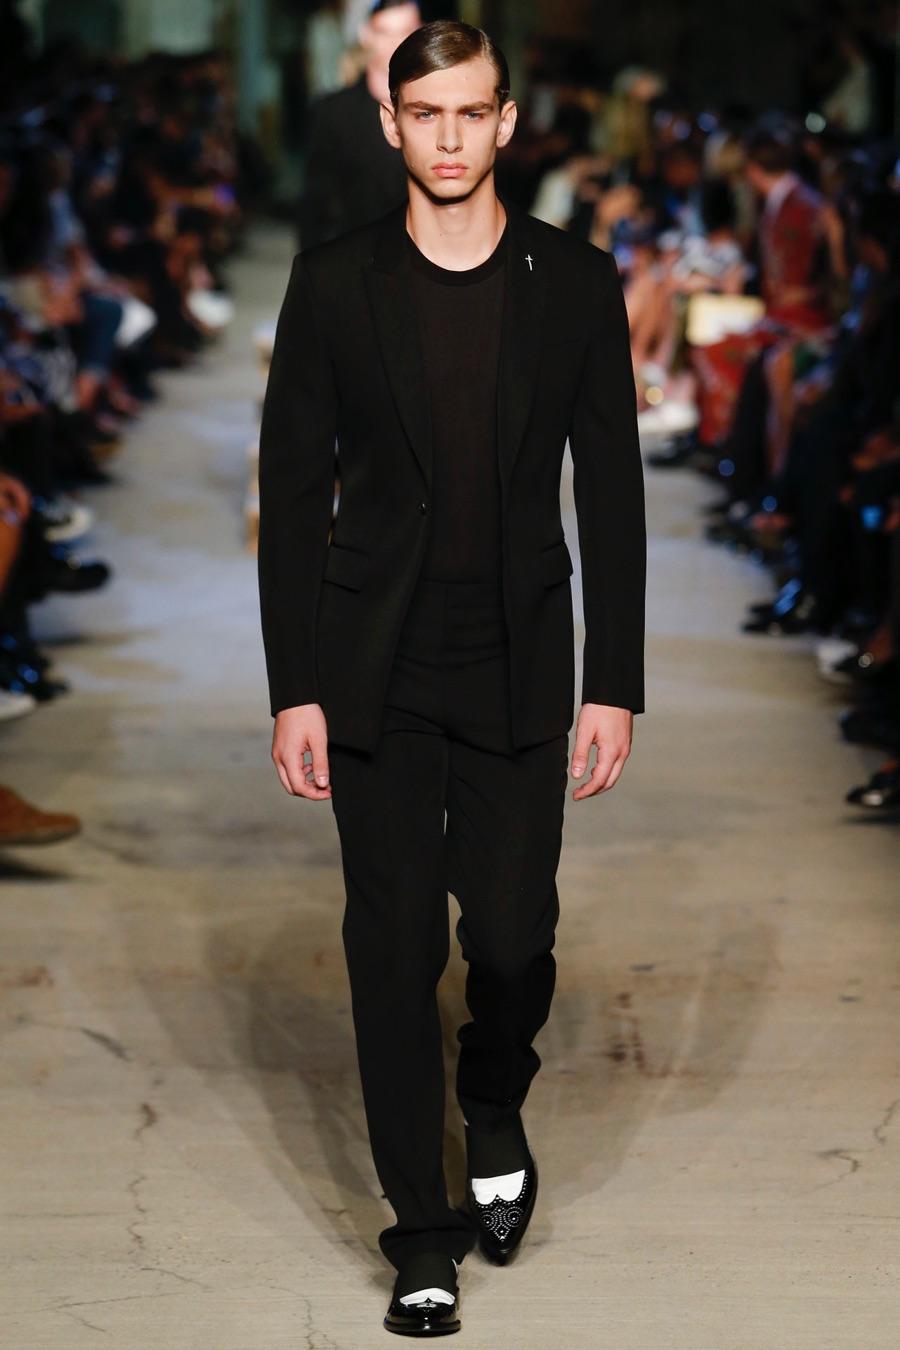 Givenchy-Spring-Summer-2016-Menswear-Collection-New-York-Fashion-Week-010.jpg